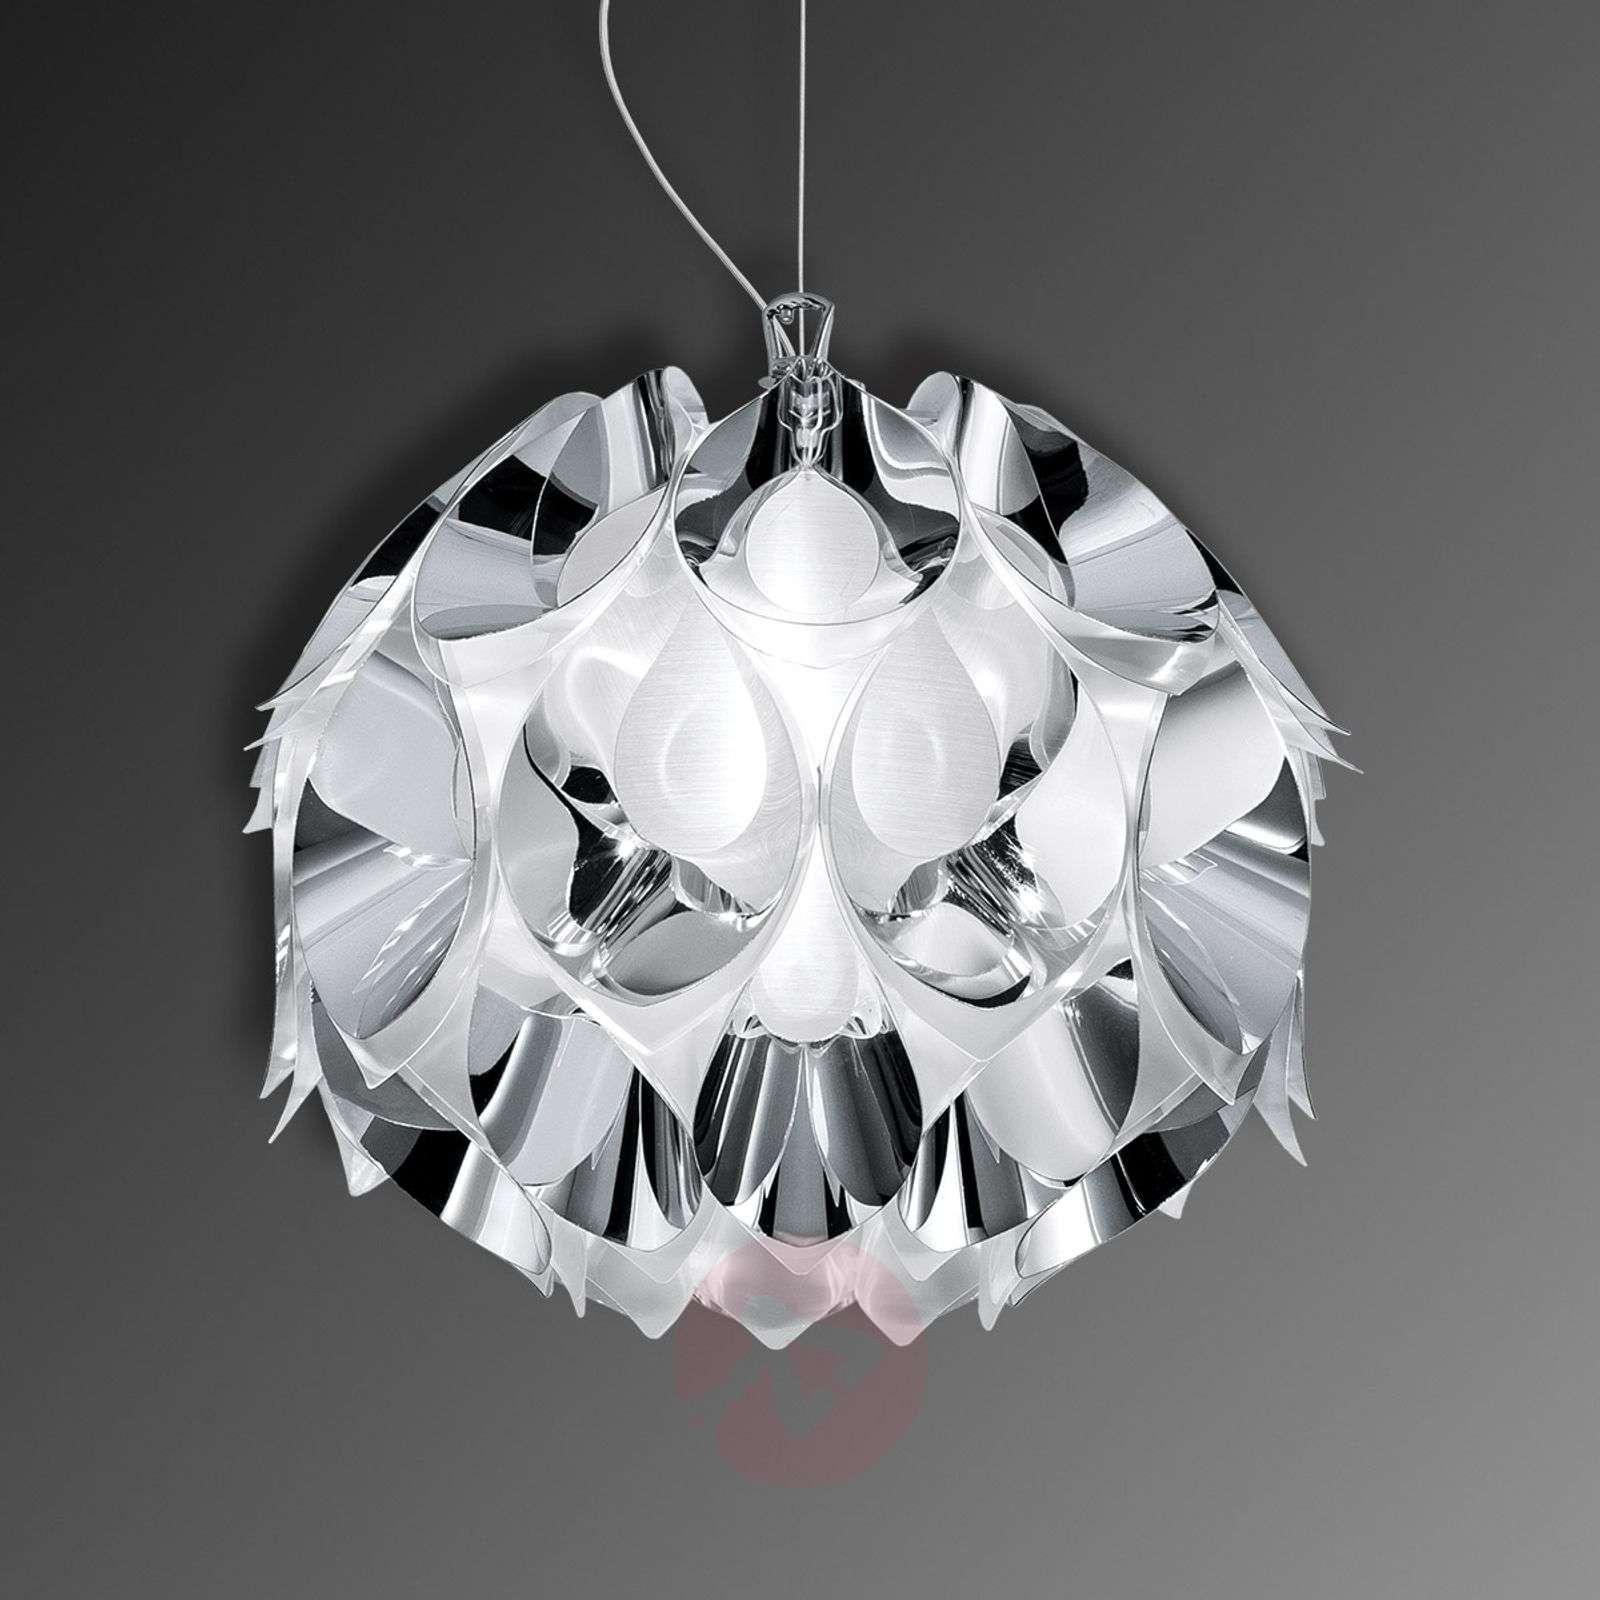 Lumoava Flora-riippuvalaisin, hopea, 36 cm-8503235-01